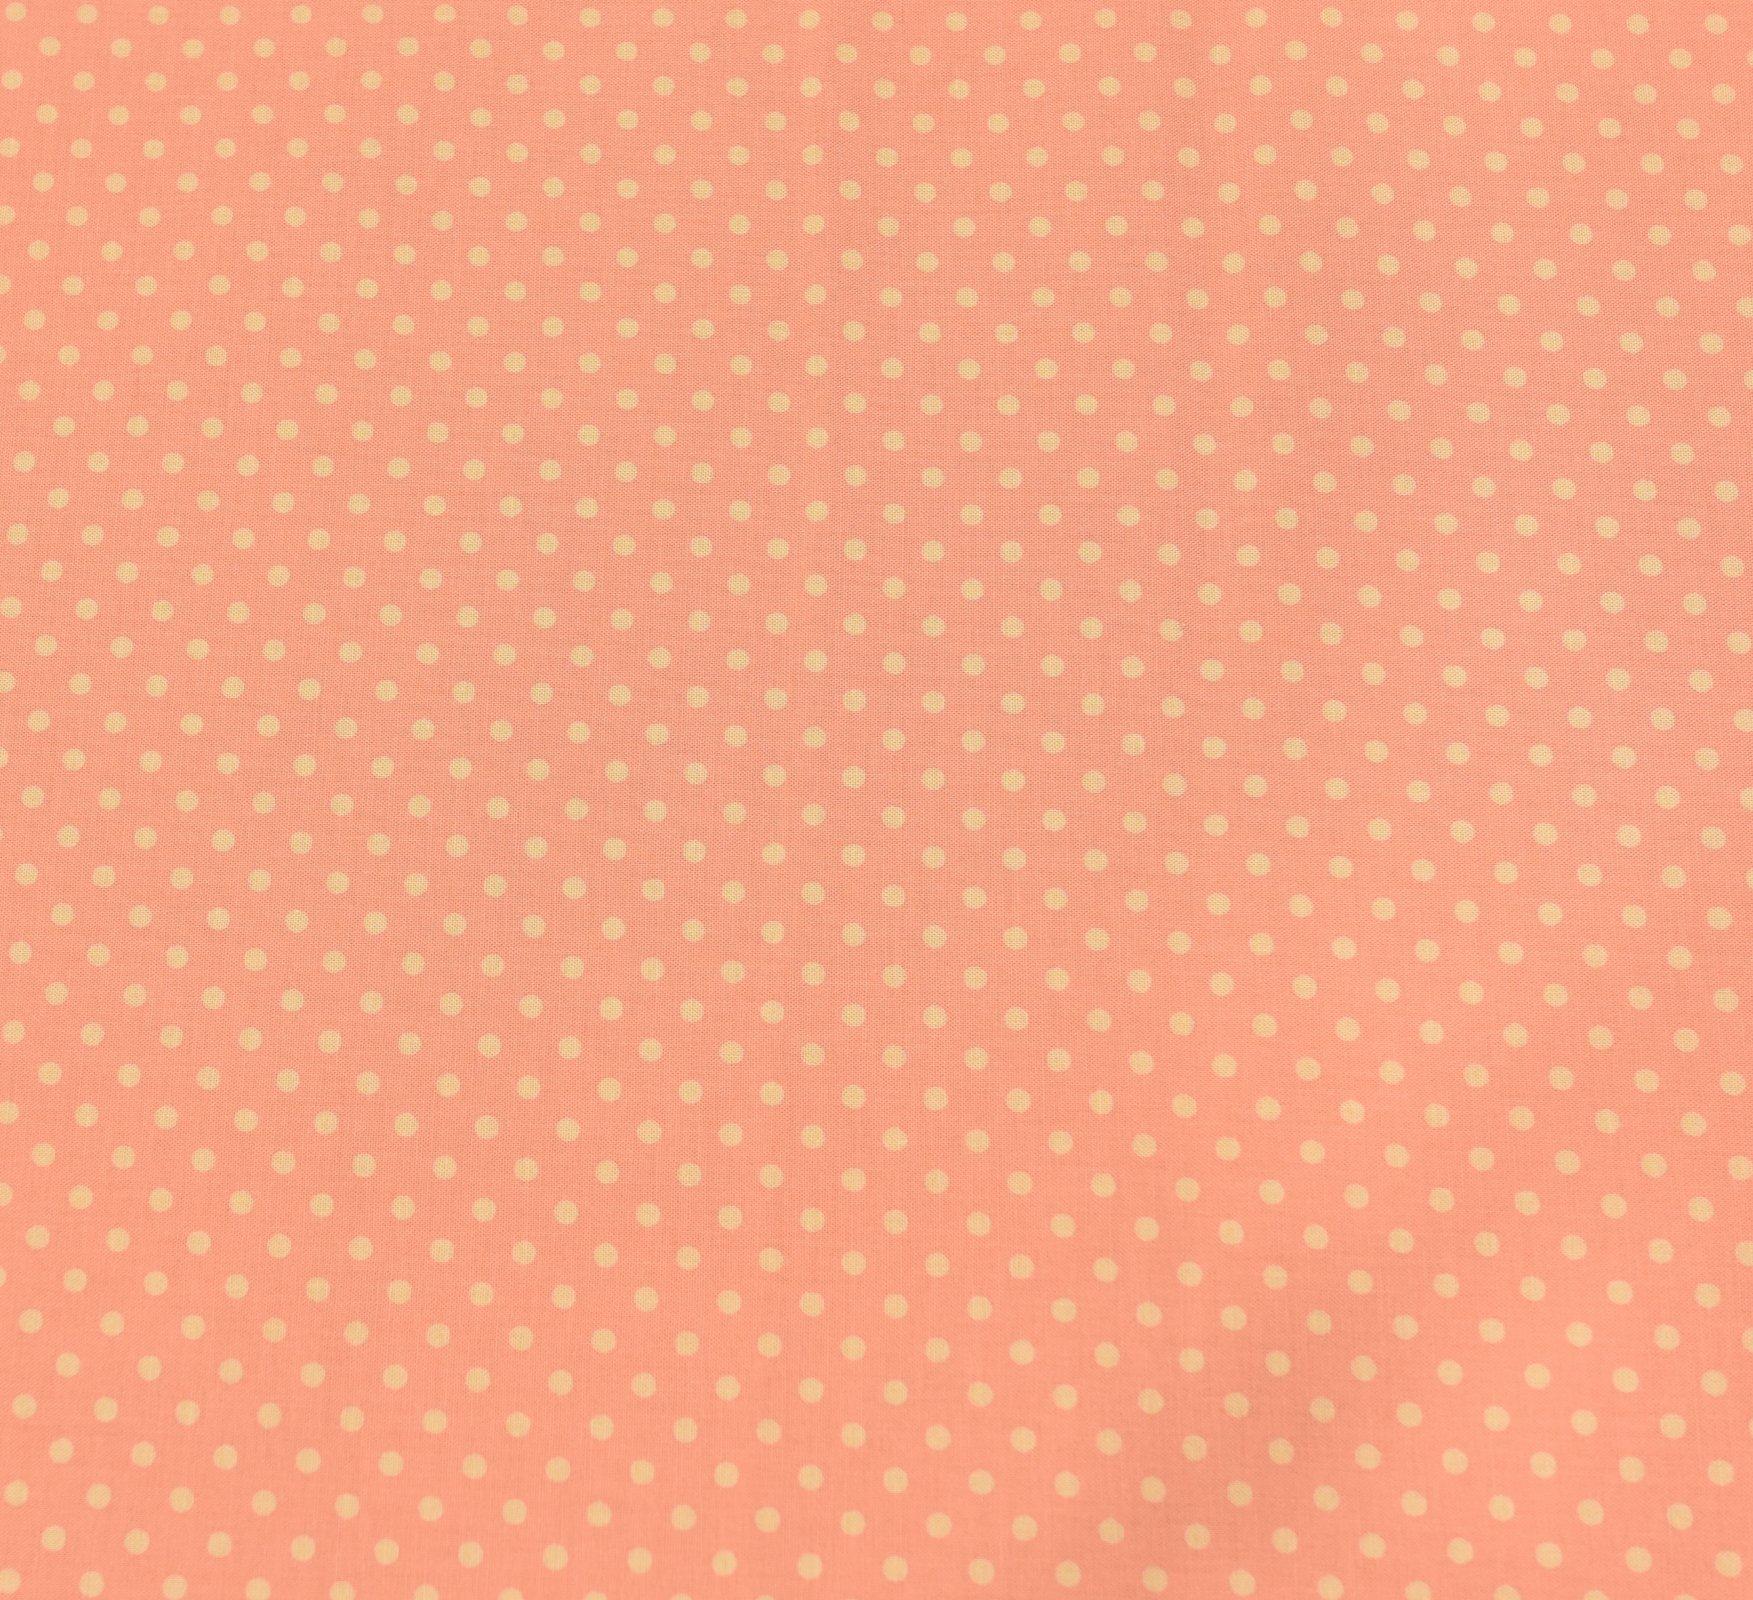 Sevenberry - Medium Dot - Yellow on Bright Peach